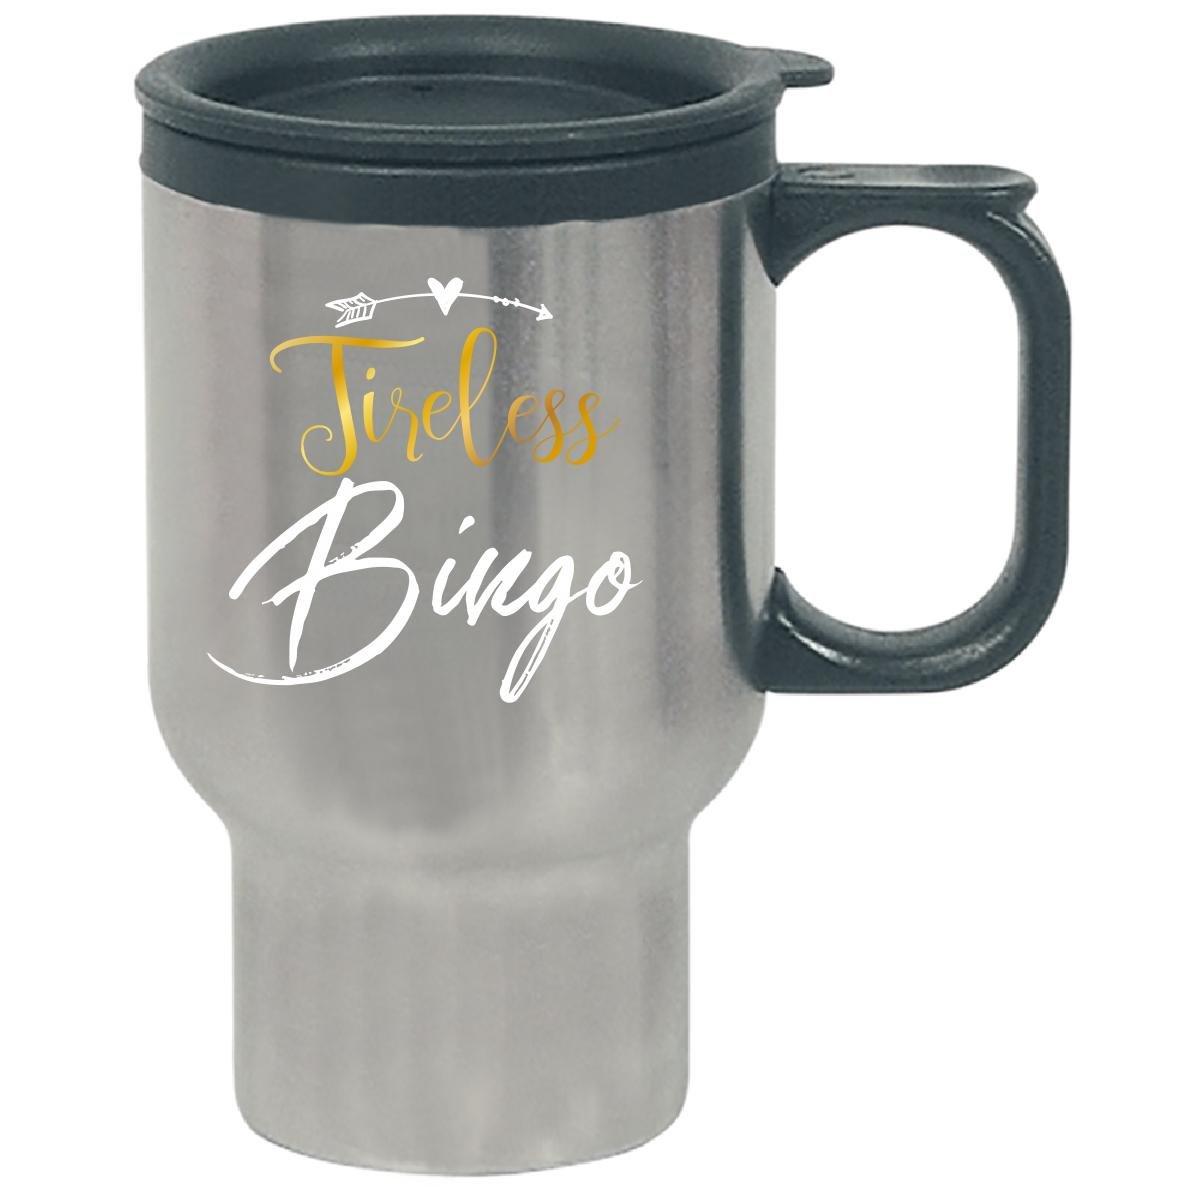 Tireless Bingo Name Mothers Day Present Grandma - Travel Mug by My Family Tee